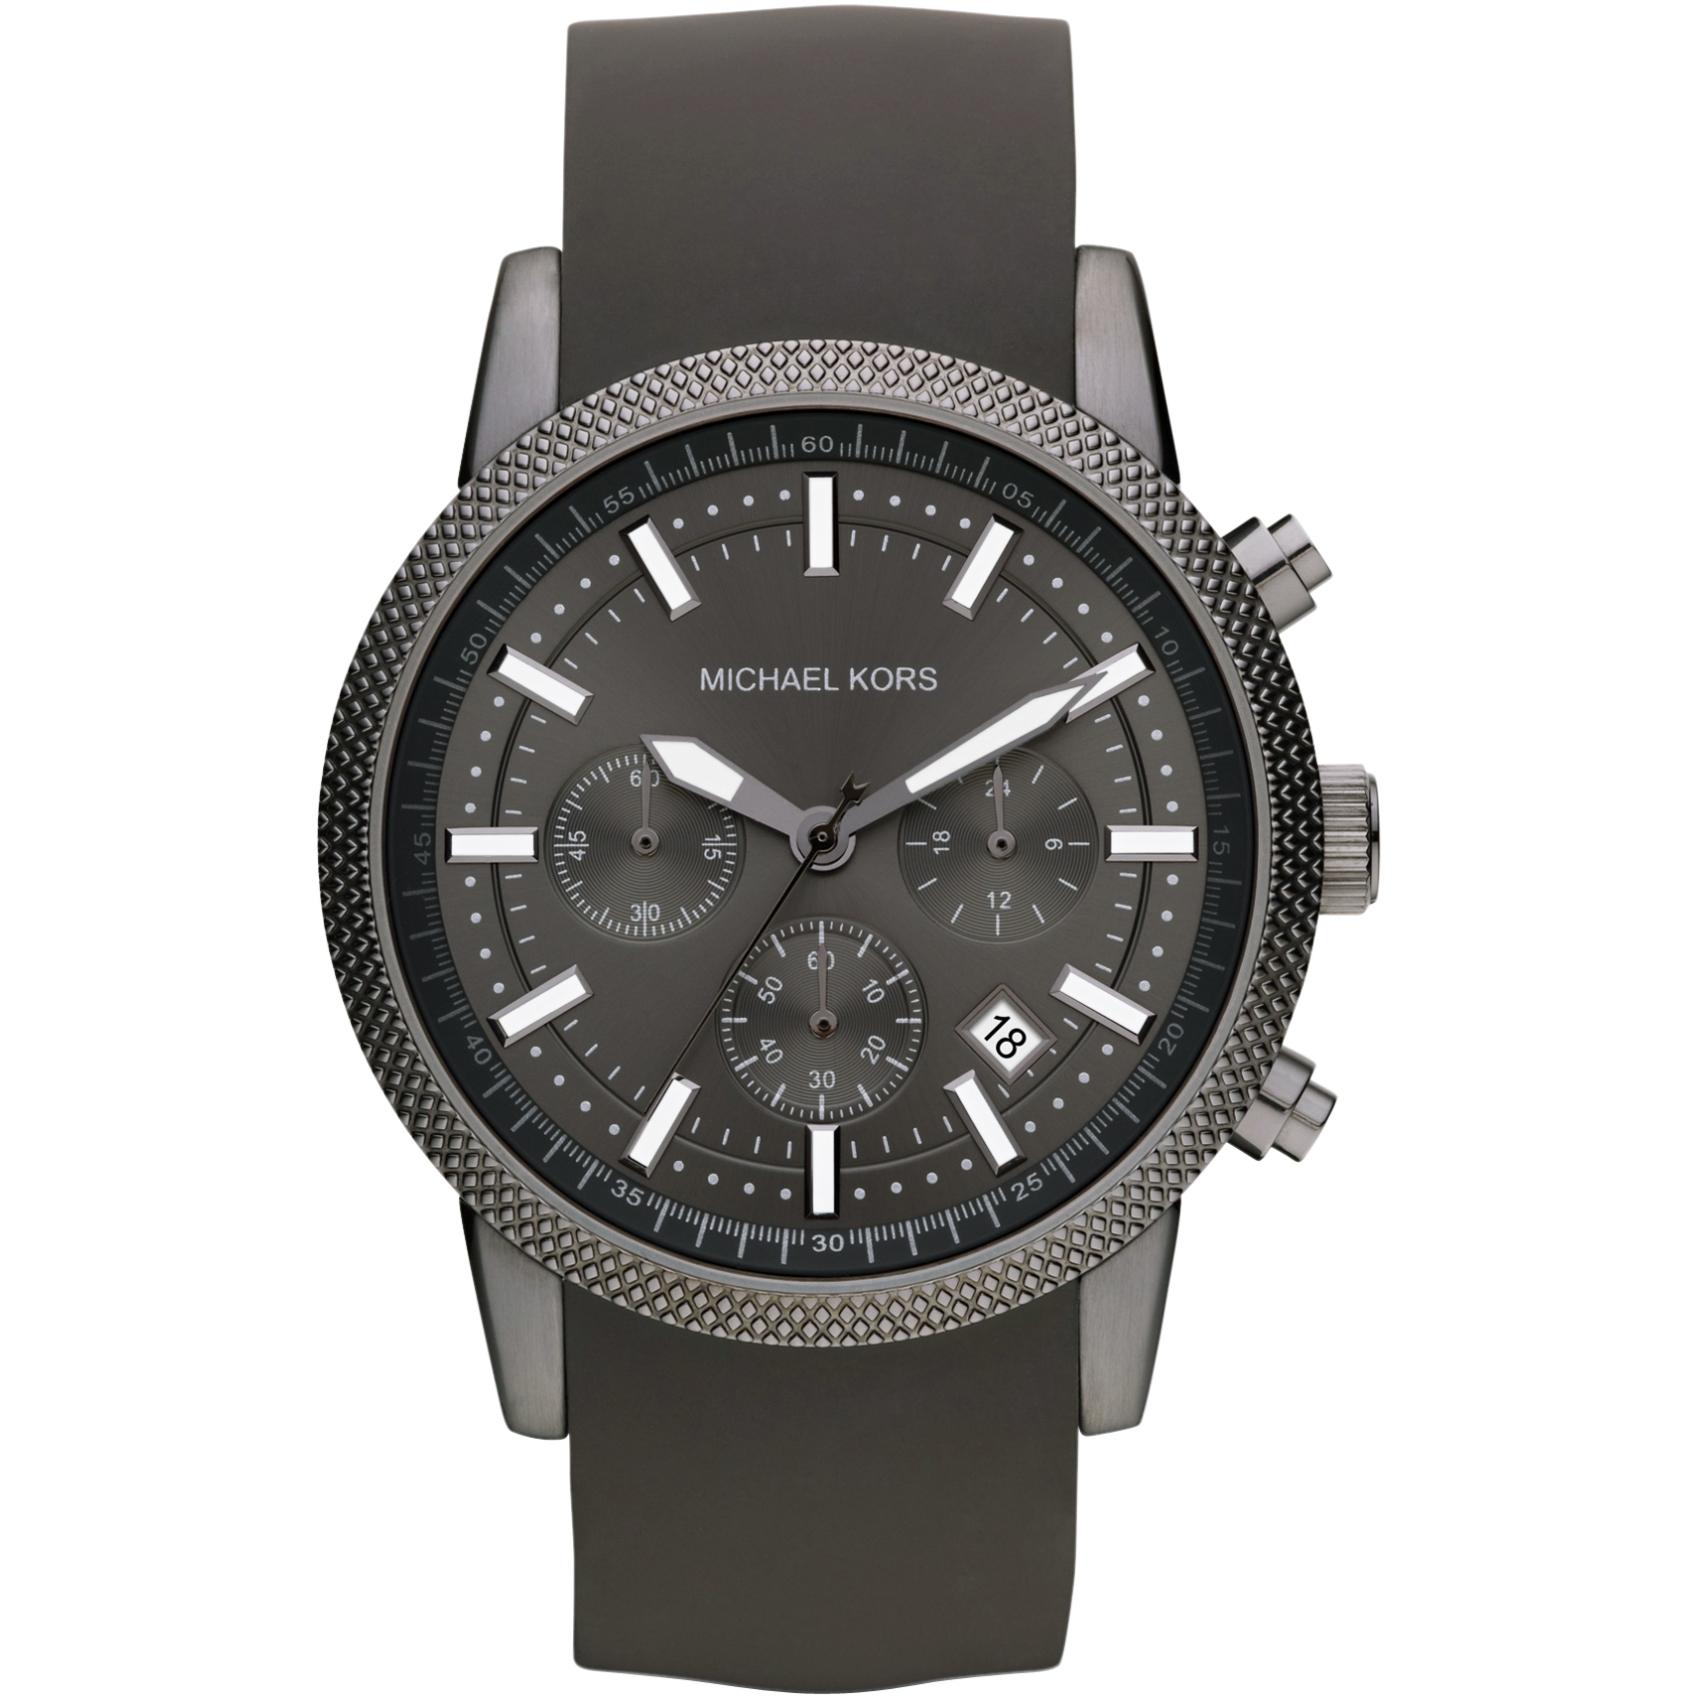 c2b5f656cef4 Gents Michael Kors Scout Chronograph Watch (MK8241)